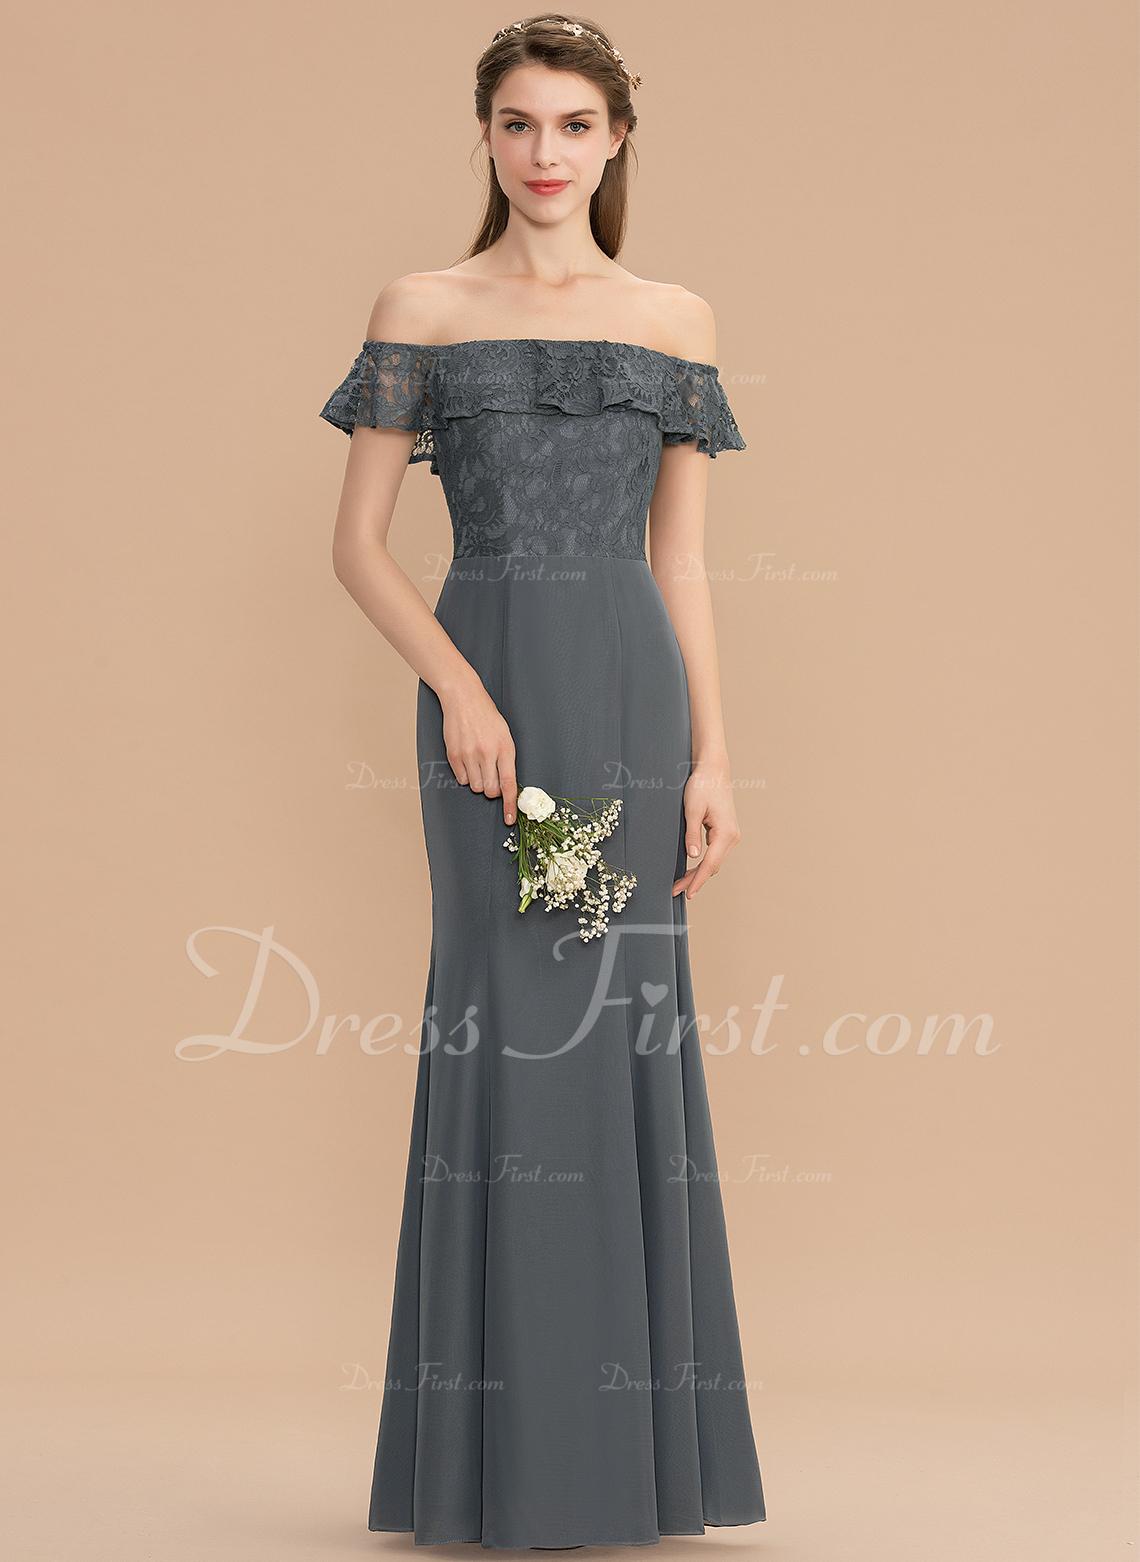 3310a8138423 Trumpet/Mermaid Off-the-Shoulder Floor-Length Chiffon Lace Bridesmaid Dress  #176731